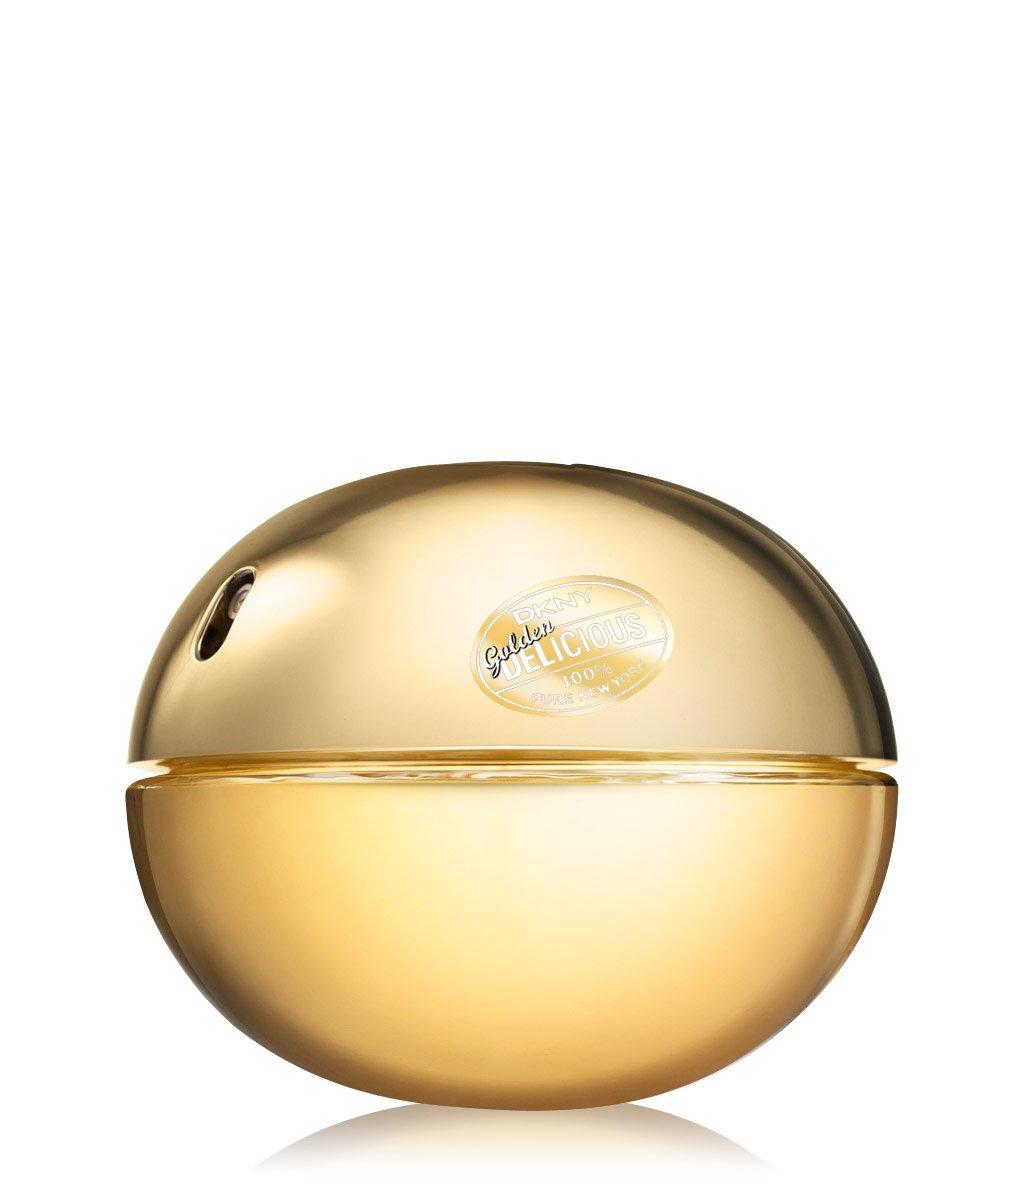 dkny golden delicious parfum online bestellen flaconi. Black Bedroom Furniture Sets. Home Design Ideas